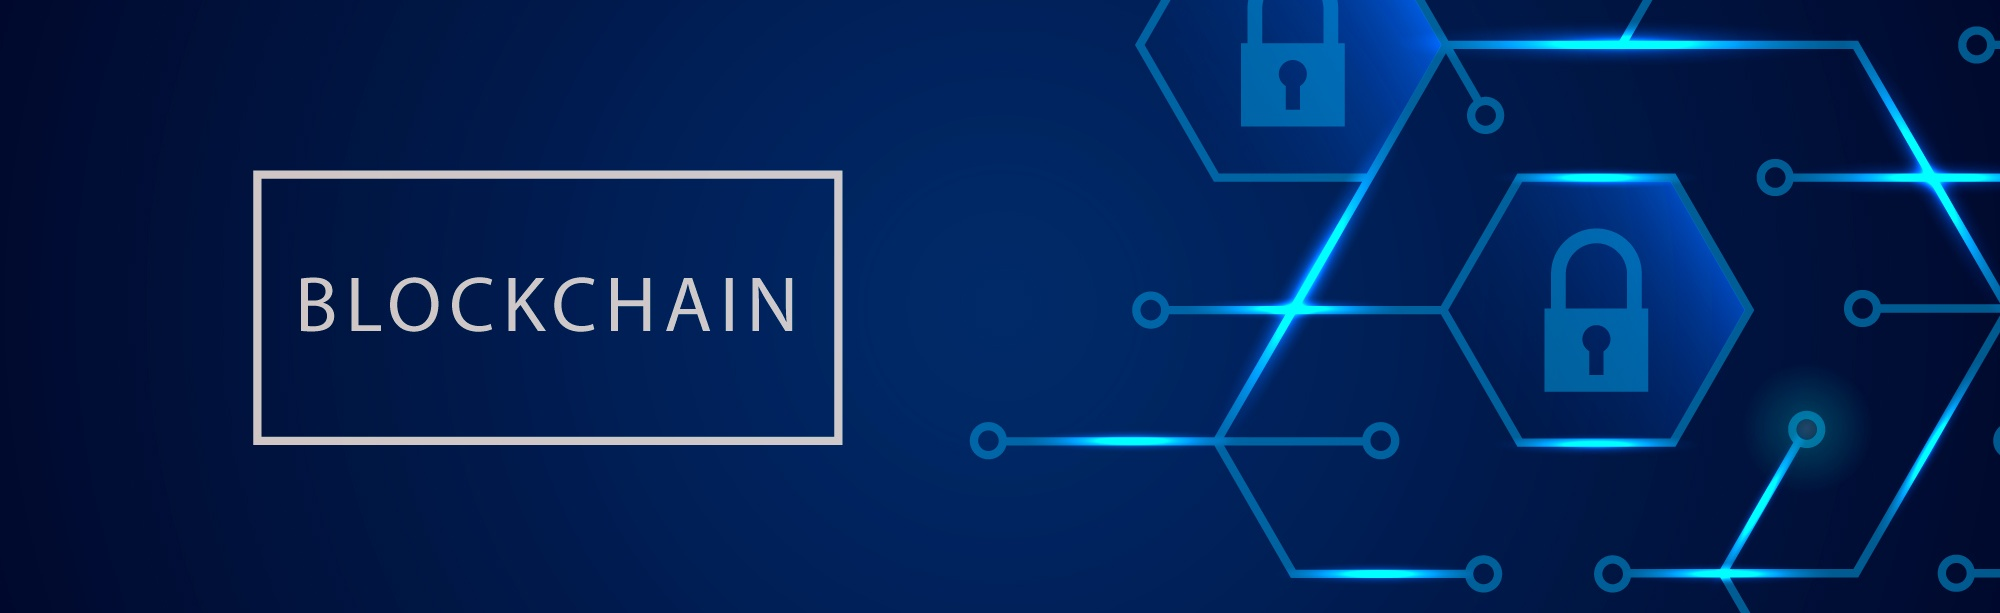 blockchain_pradeo-1.jpg